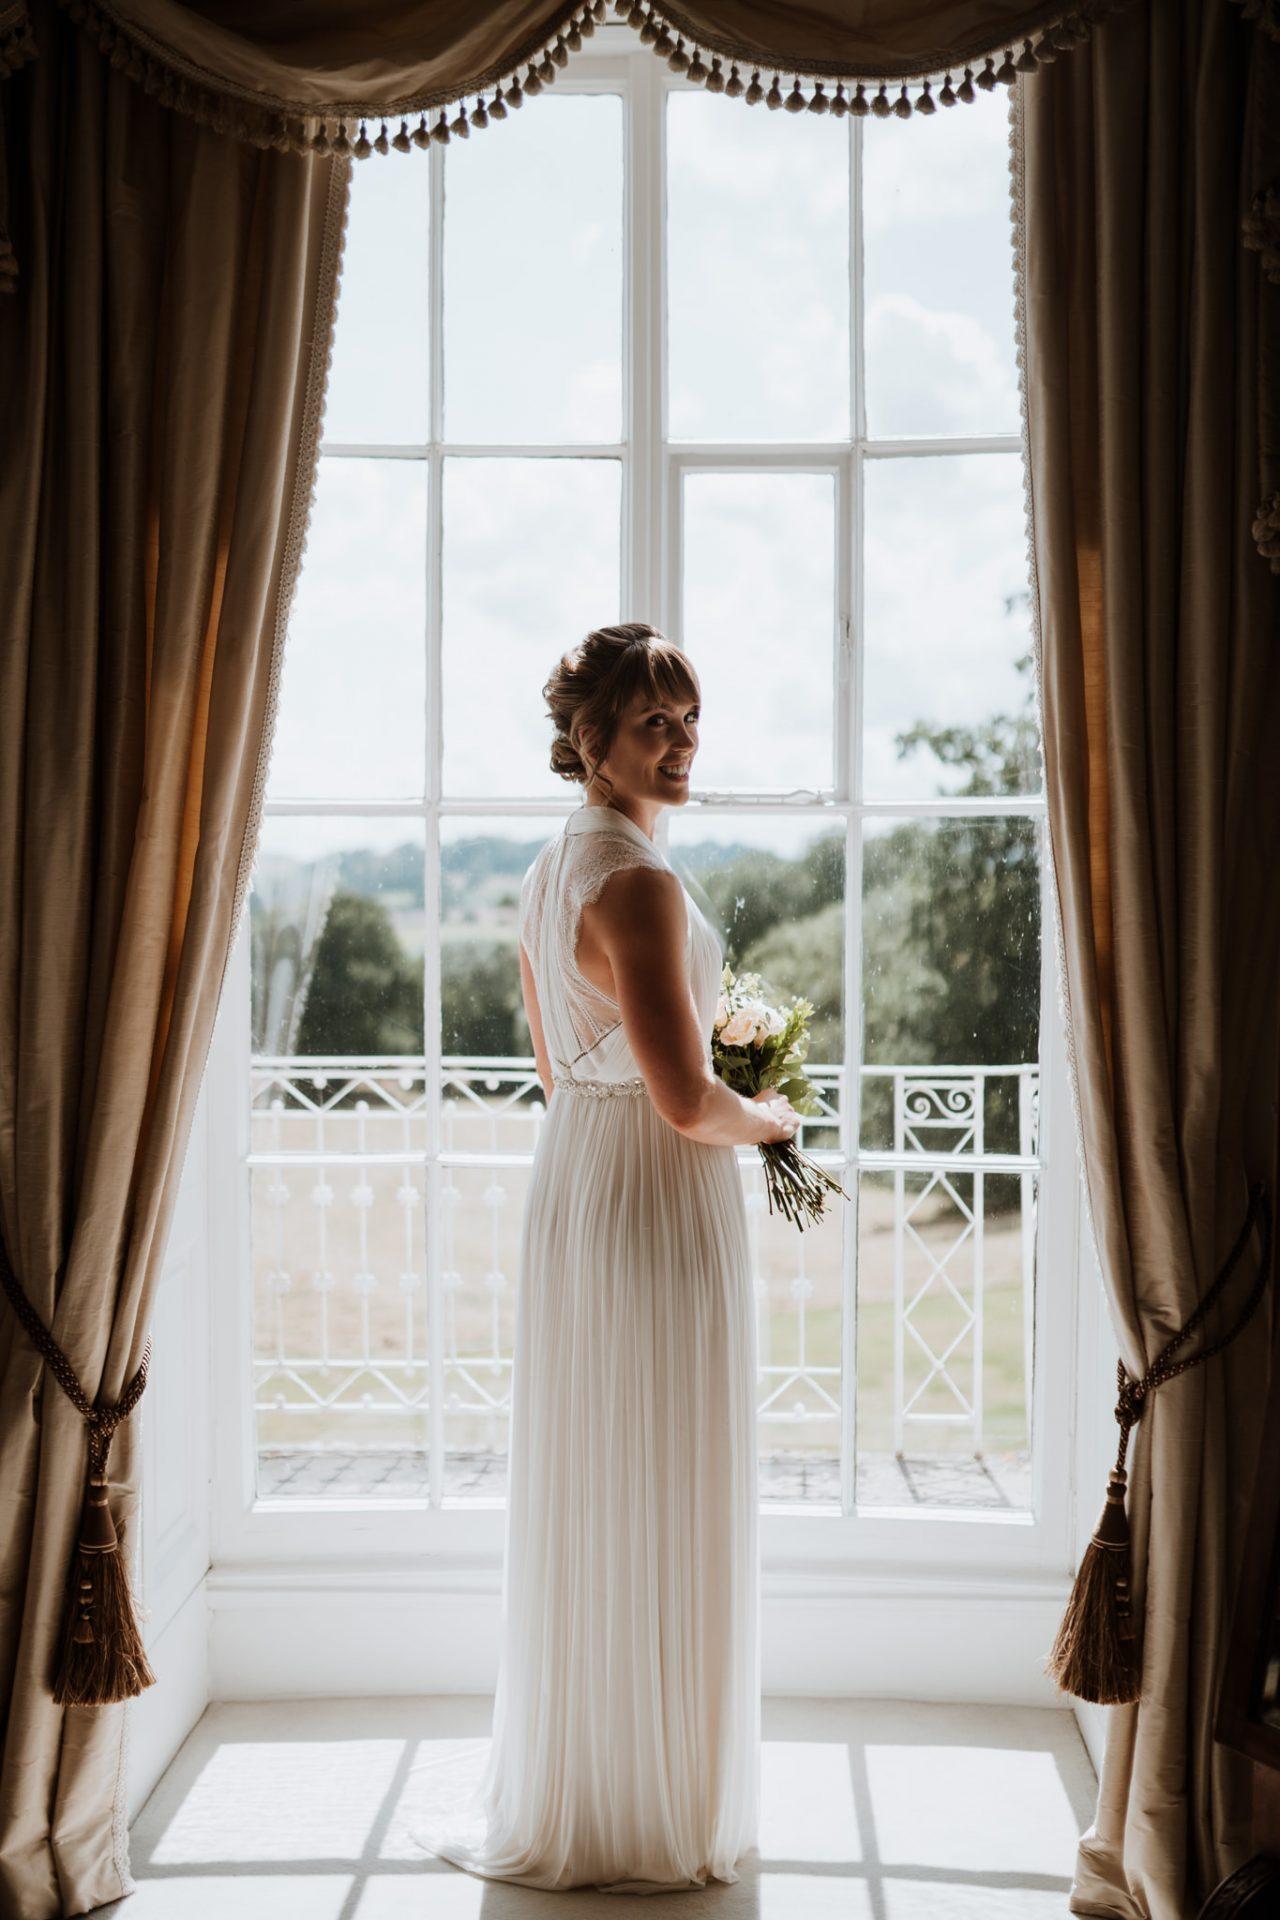 bride full length portrait in french windows